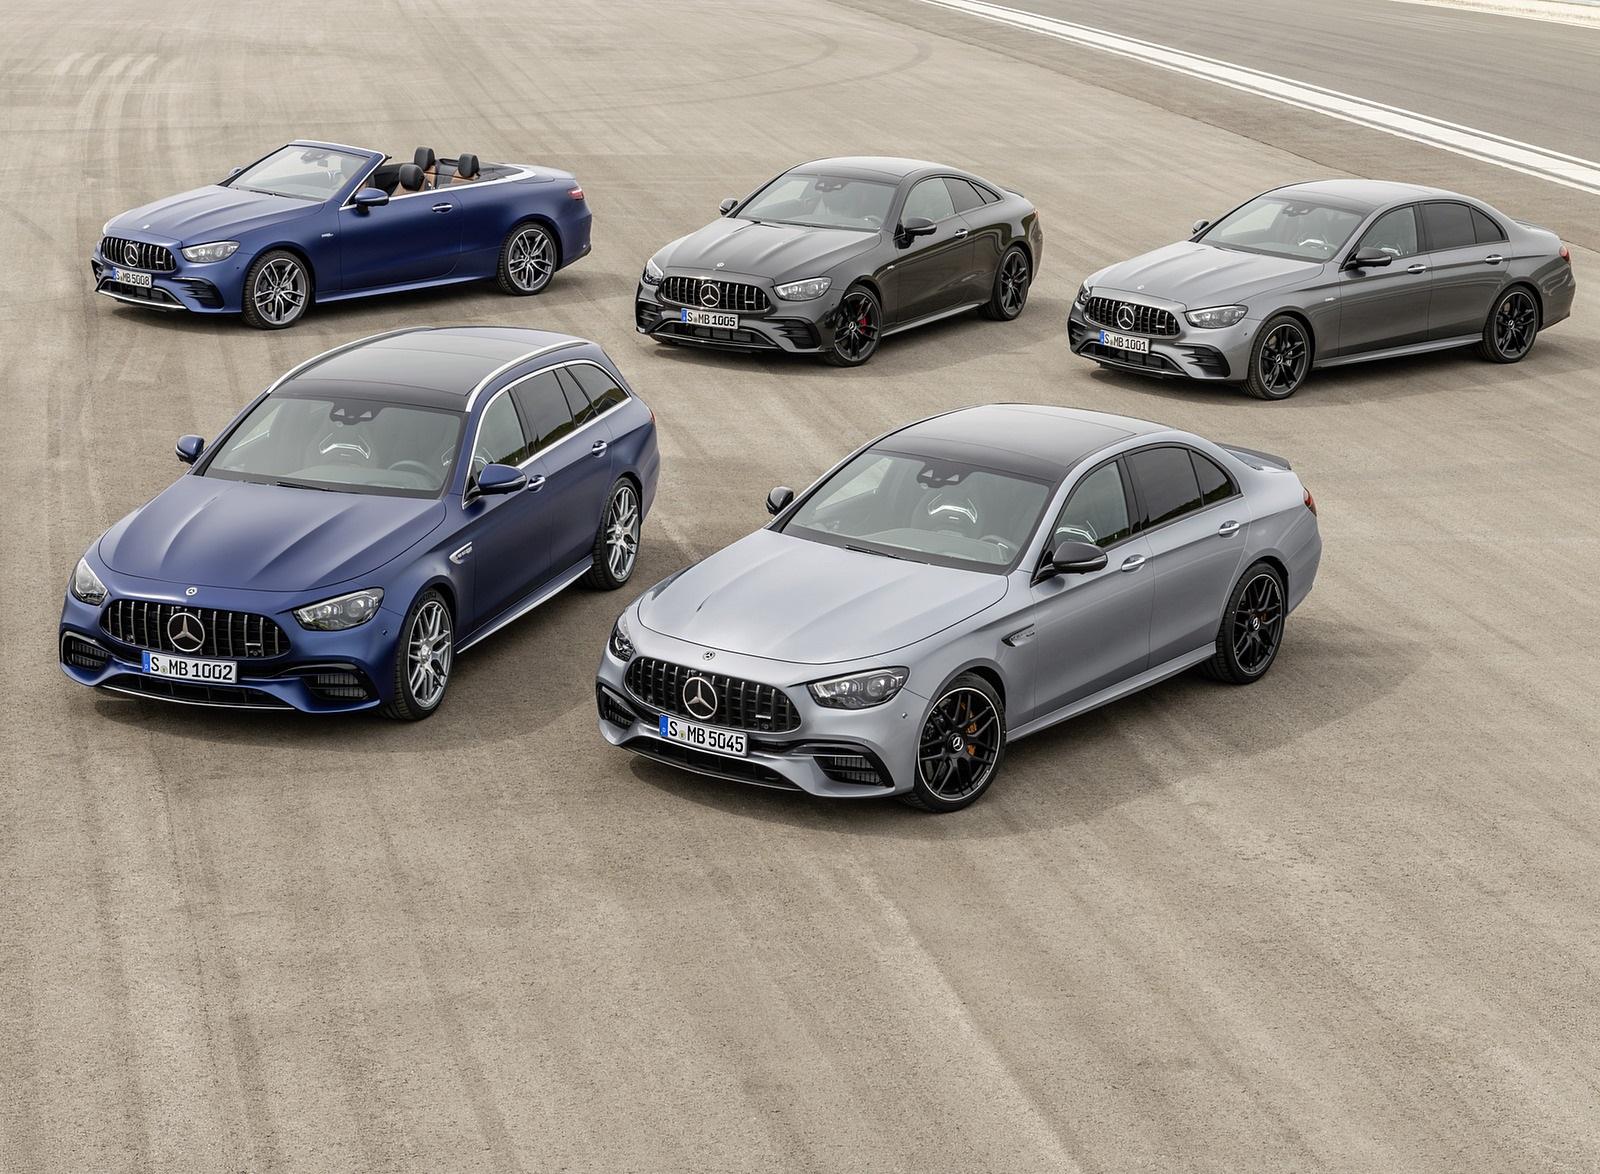 2021 Mercedes-AMG E 63 S Sedan and Estate Wallpapers (8)